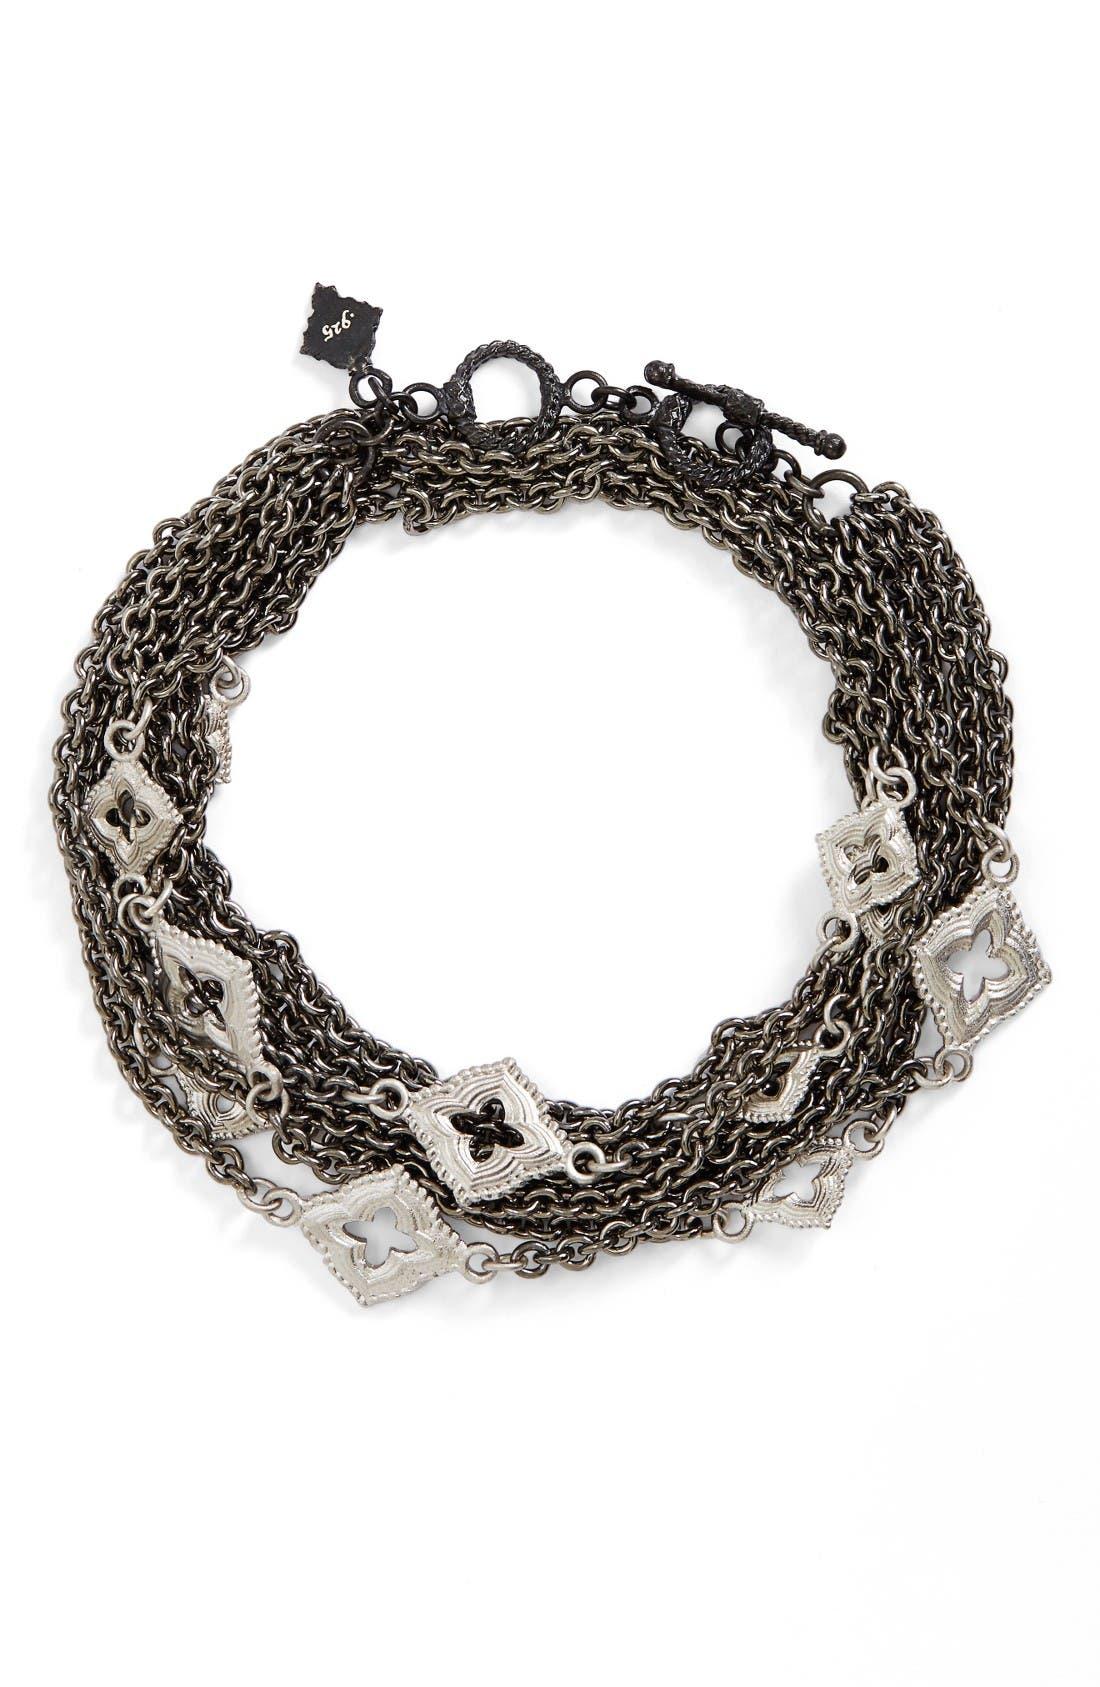 Alternate Image 1 Selected - Armenta New World Double Wrap Scroll Bracelet